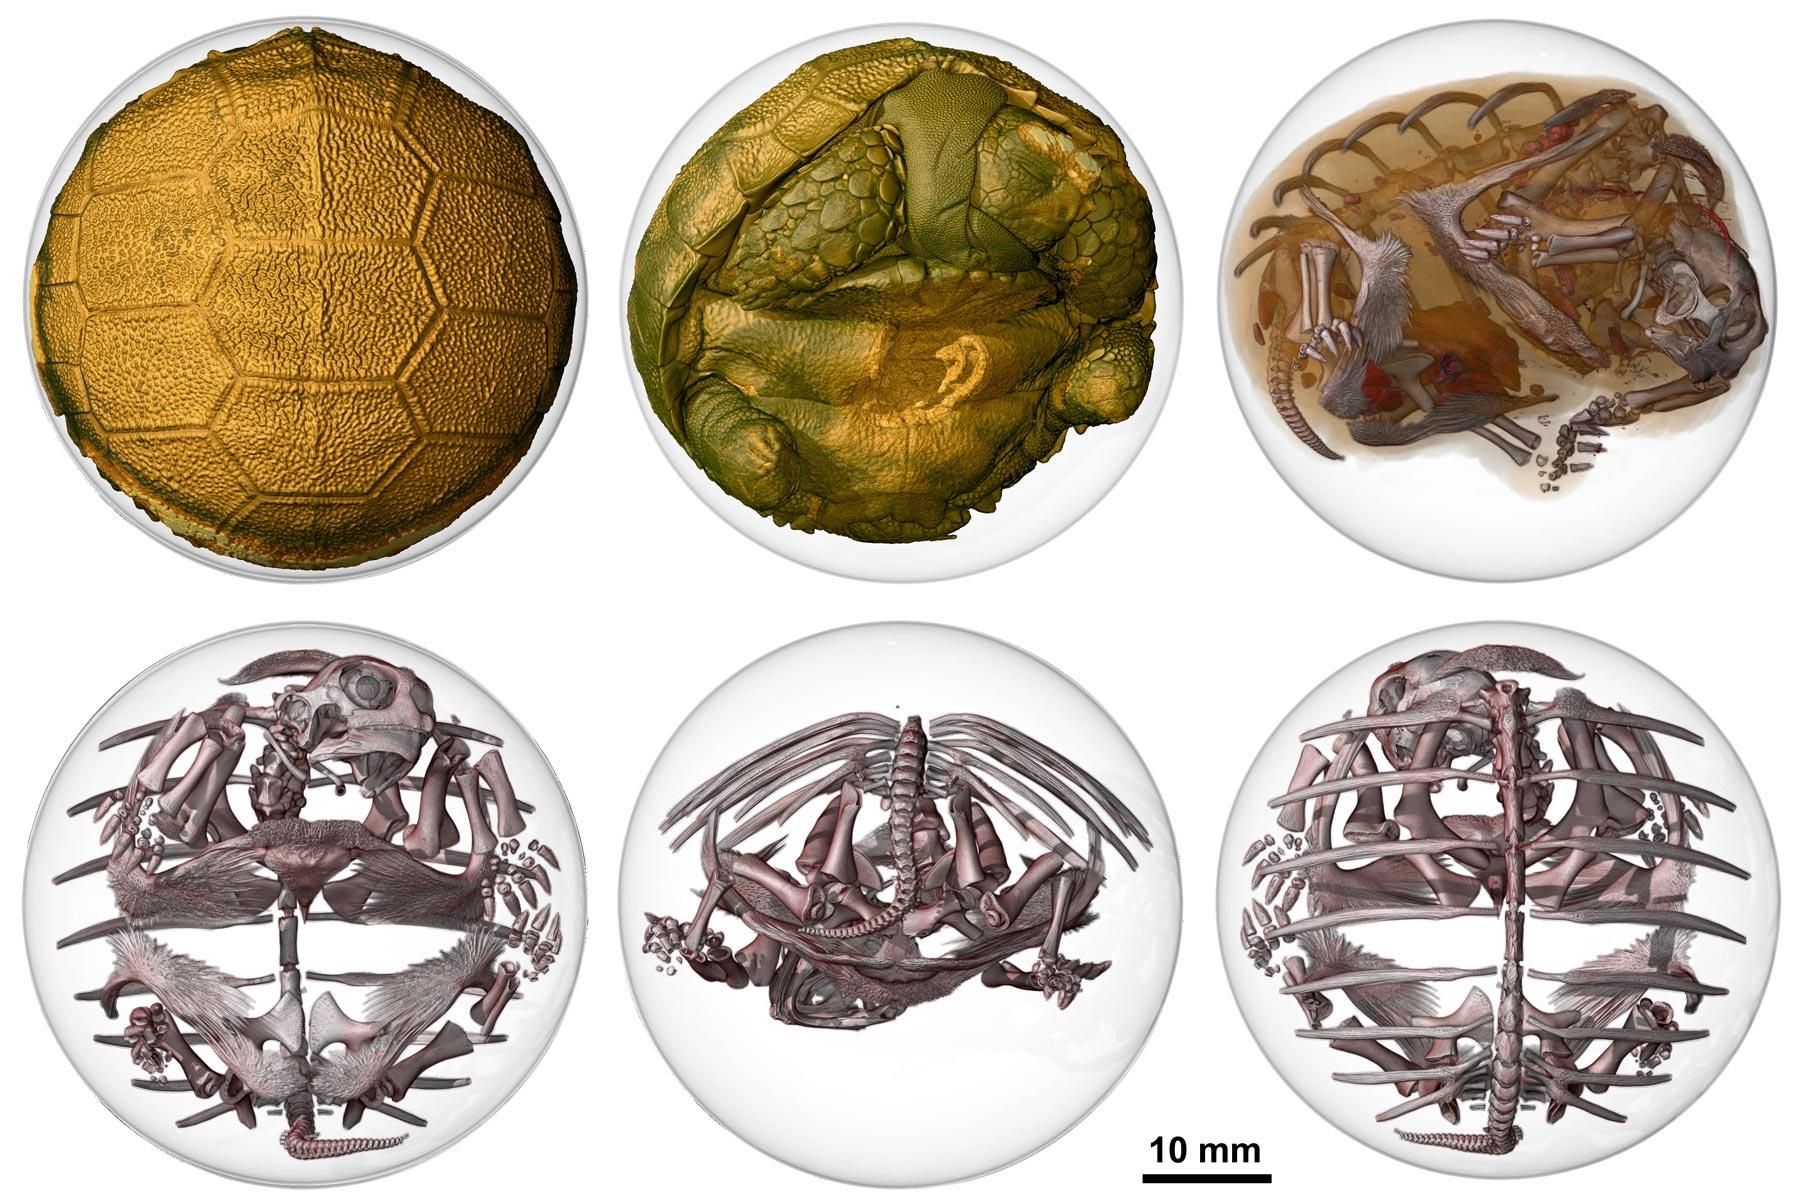 beauty of science inside a turtle egg